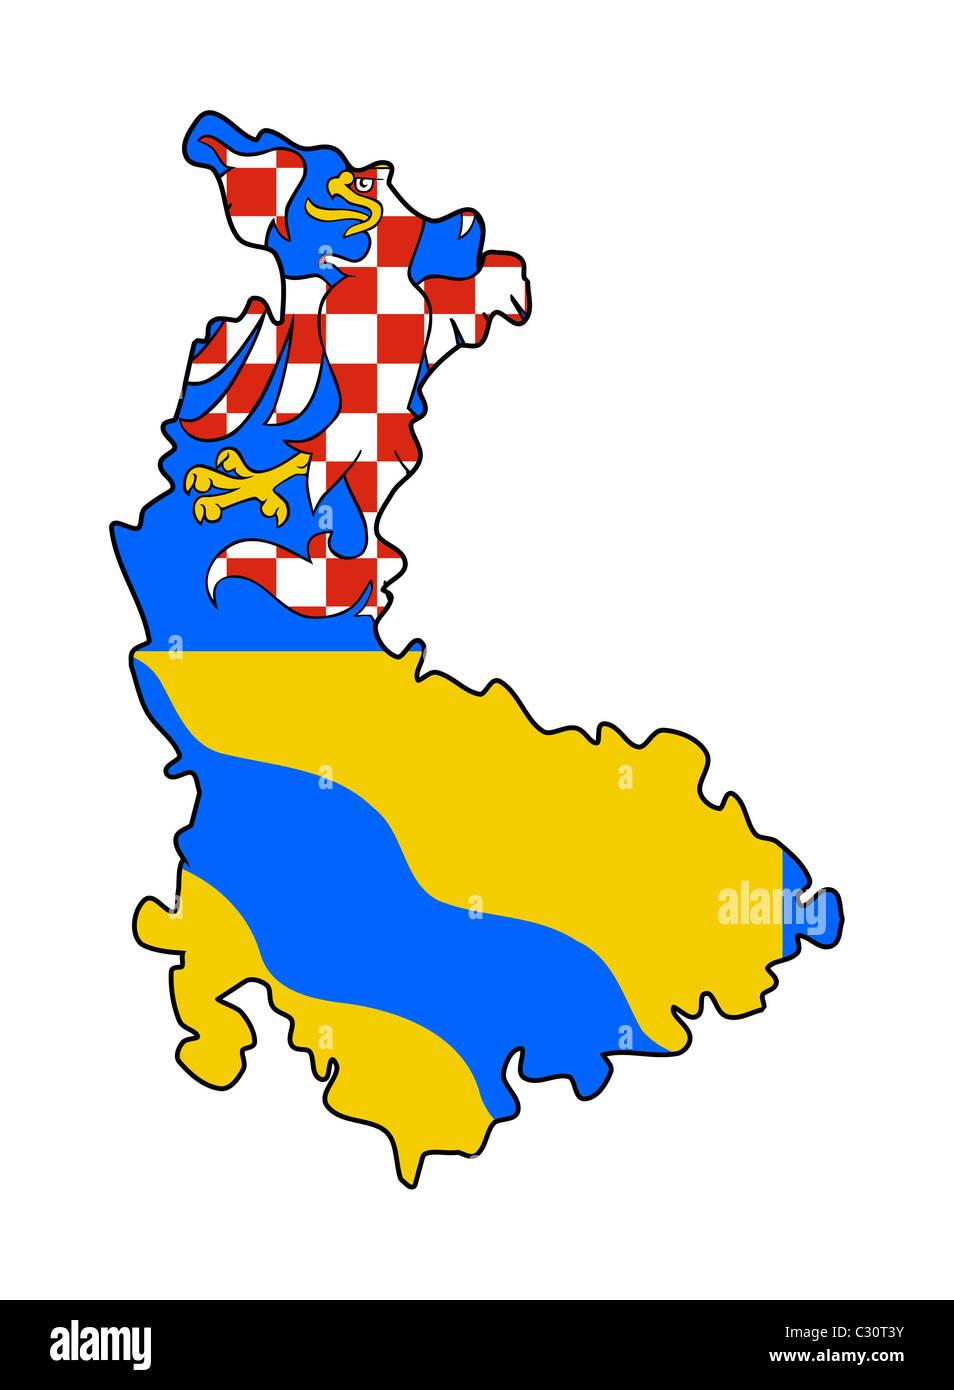 Flag of Olomouc region of Czech Republic on map isolated on white